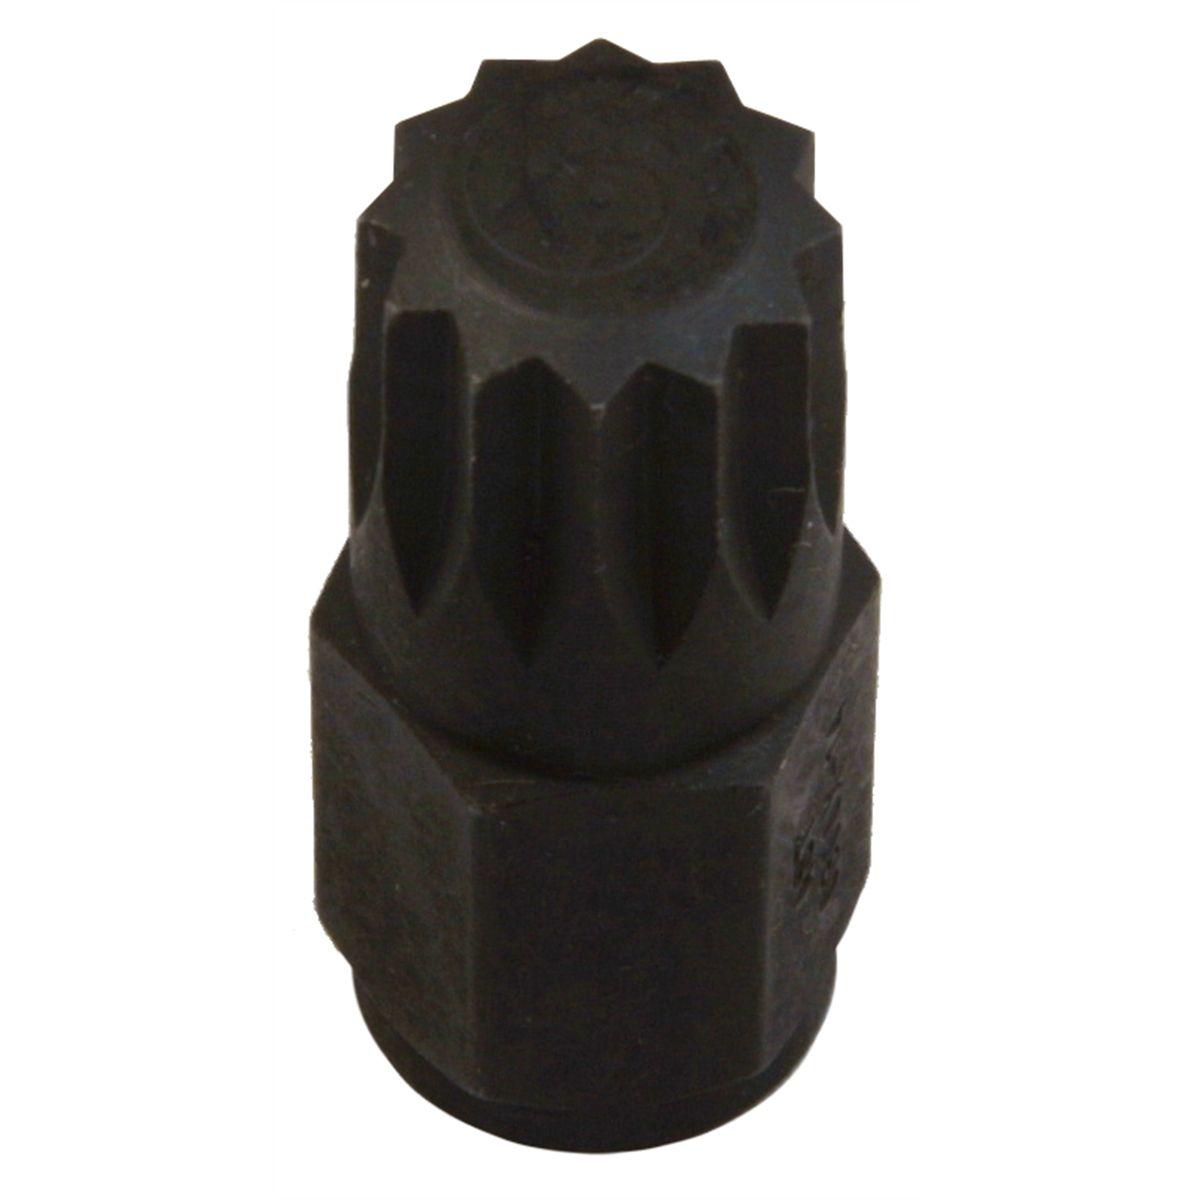 14mm 12 Pt Socket Bit Assenmacher Specialty Tools